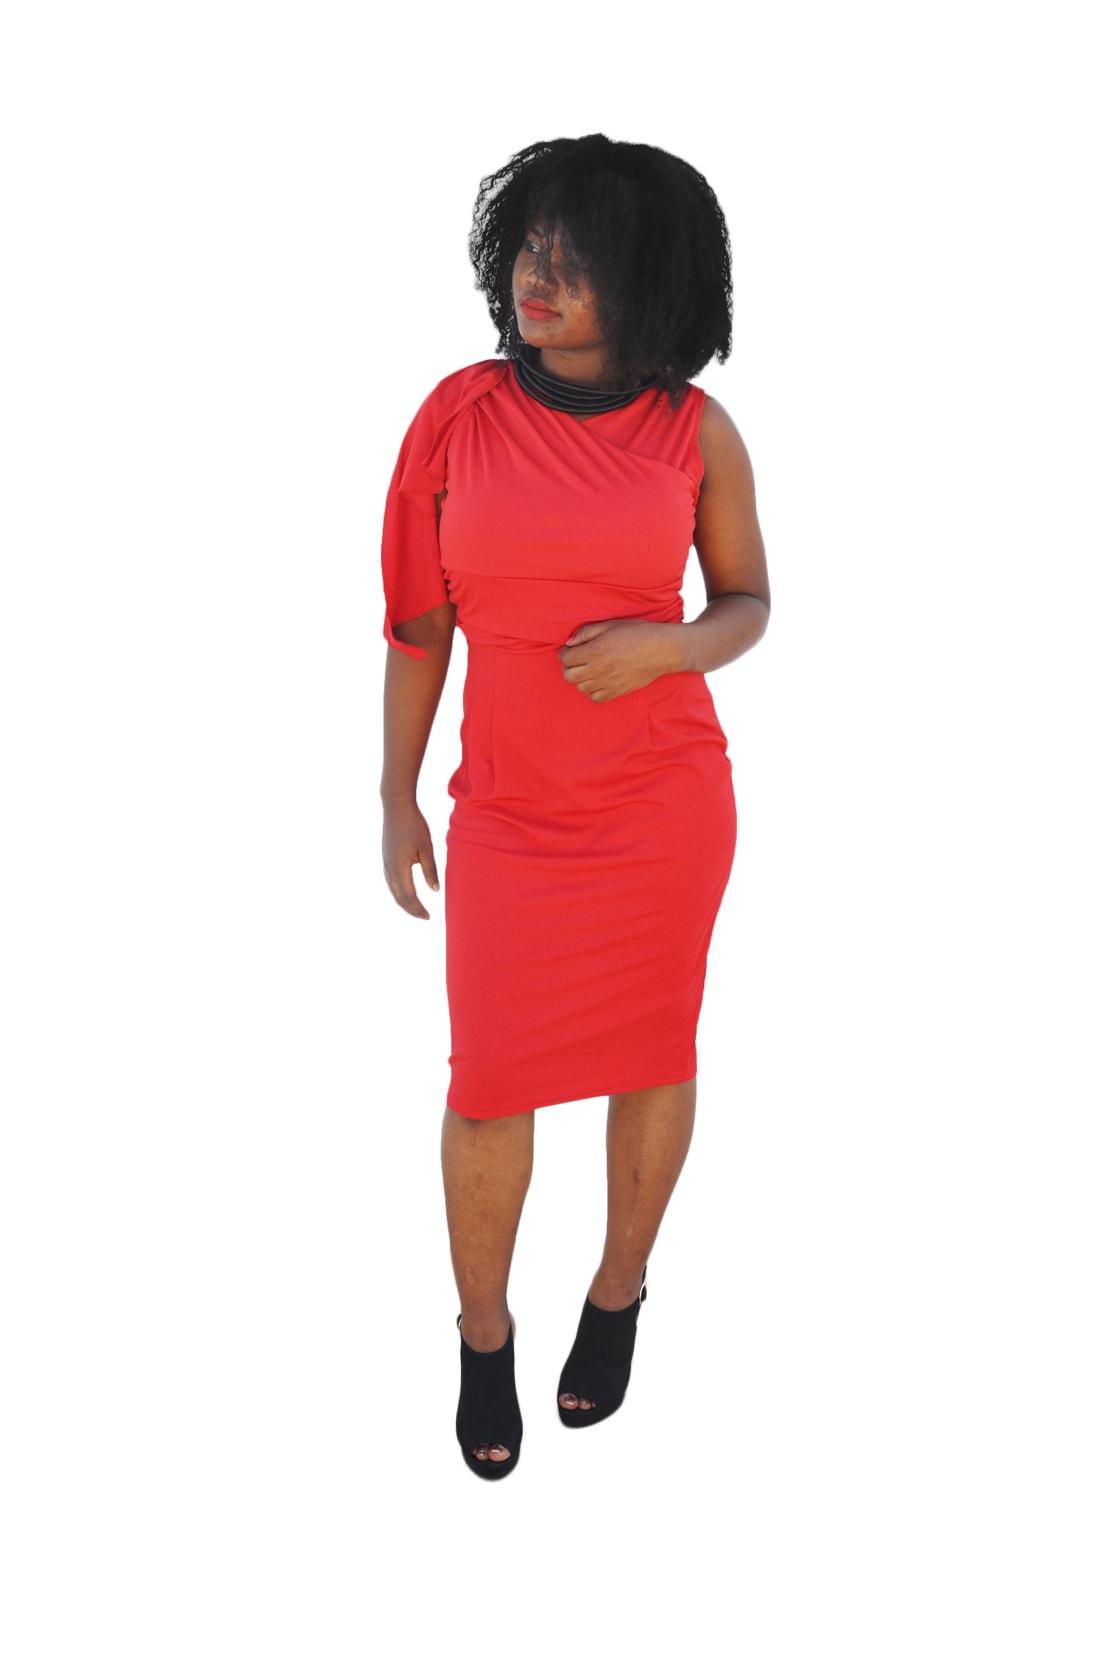 M0188 red1 Short Sleeve Dresses maureens.com boutique